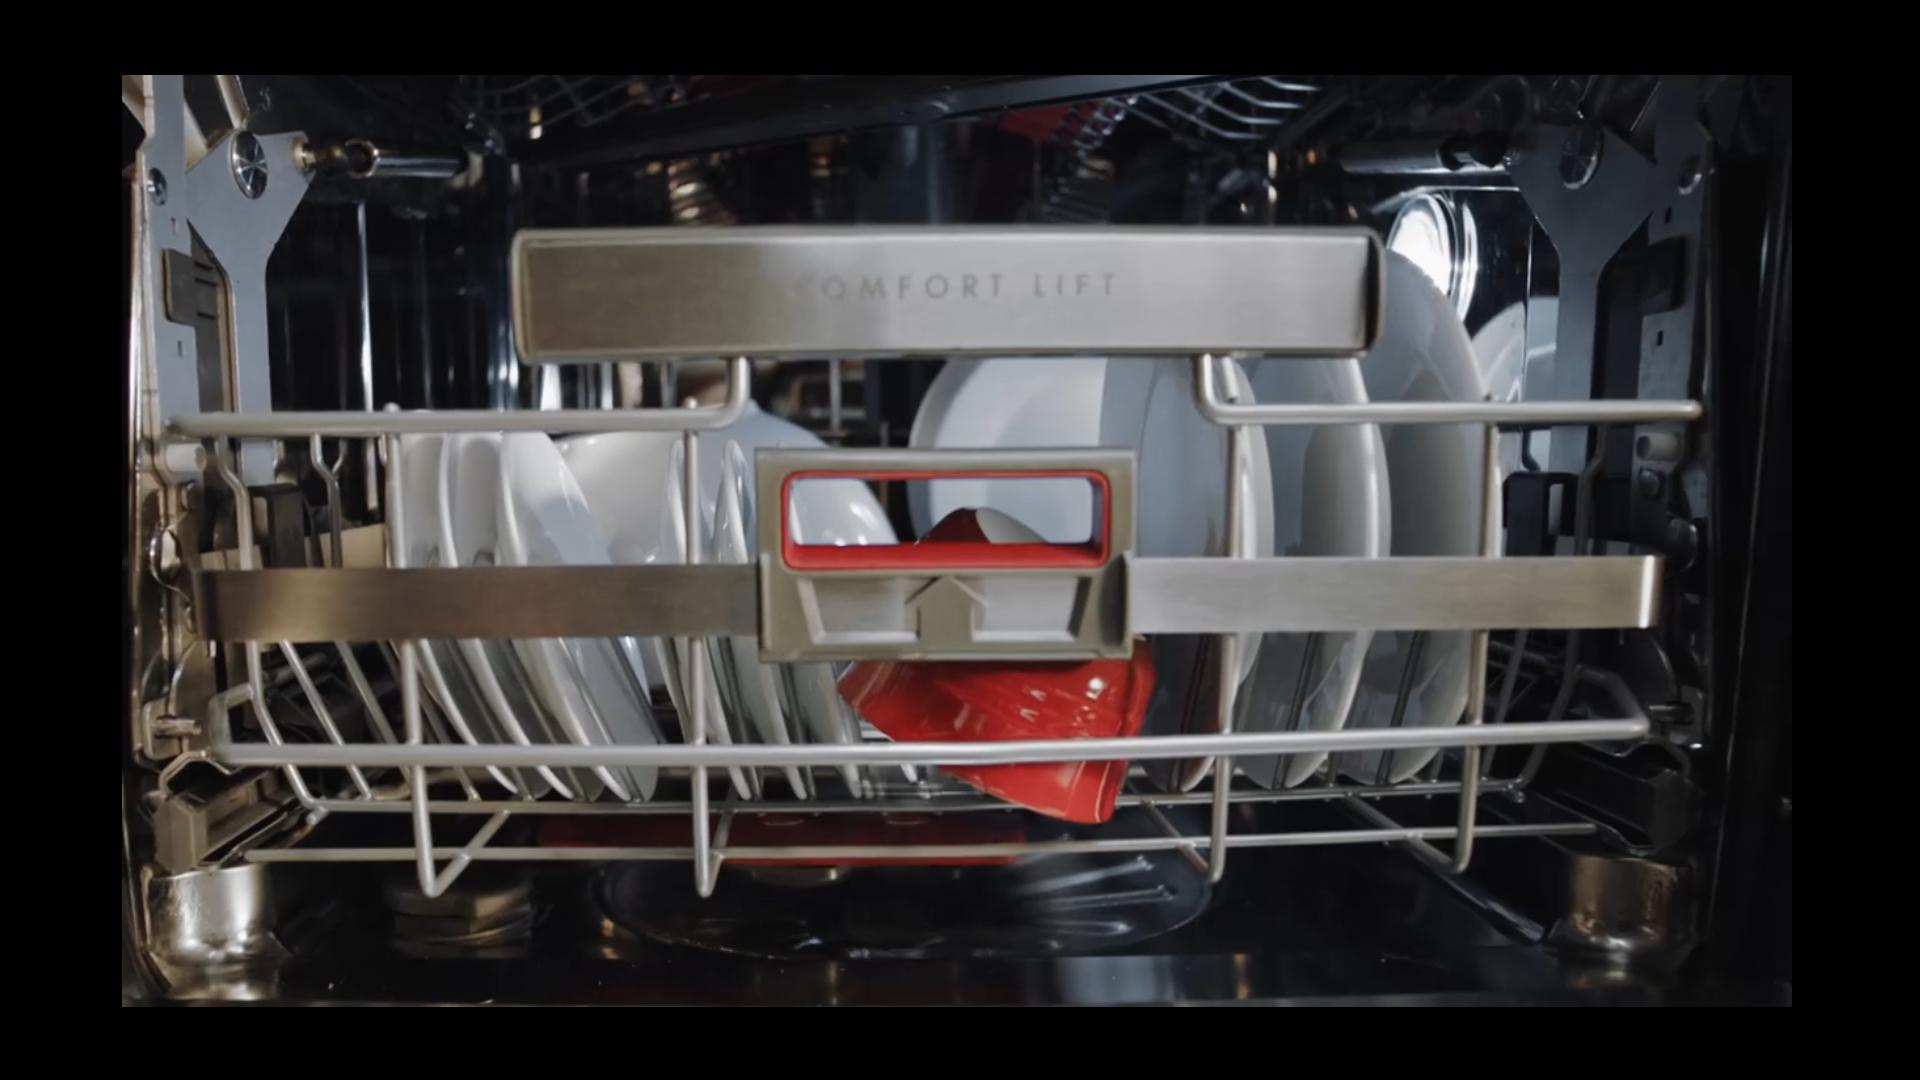 Aeg Customflex Kühlschrank : Aeg comfortlift geschirrspüler electroplus herrmann in völklingen